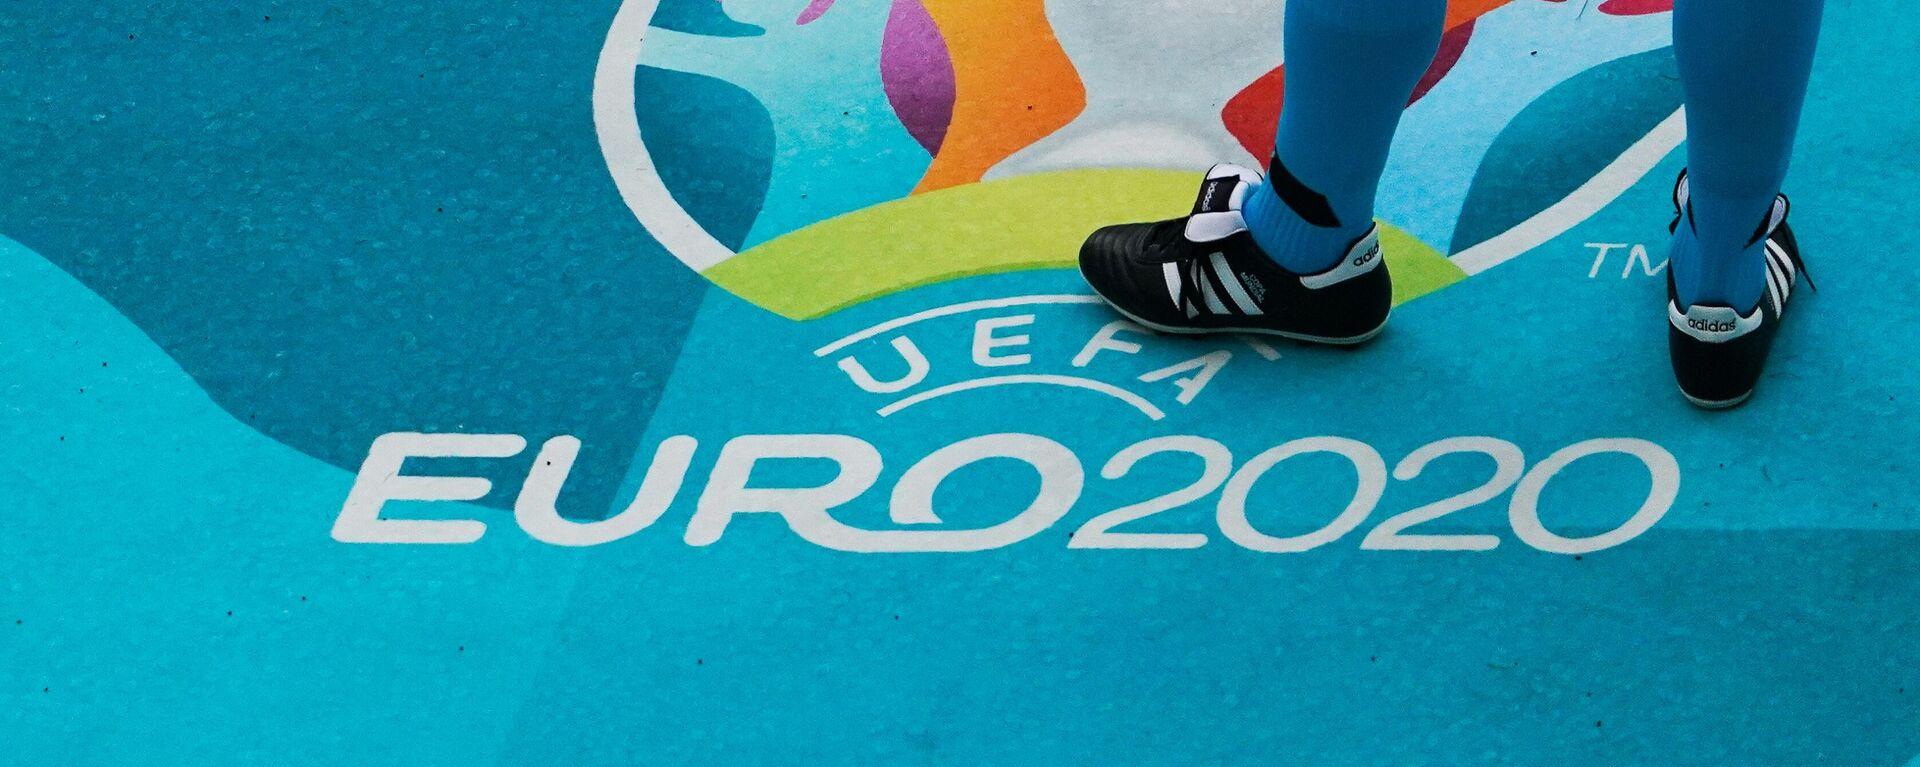 Euro 2020 - SNA, 1920, 05.07.2021